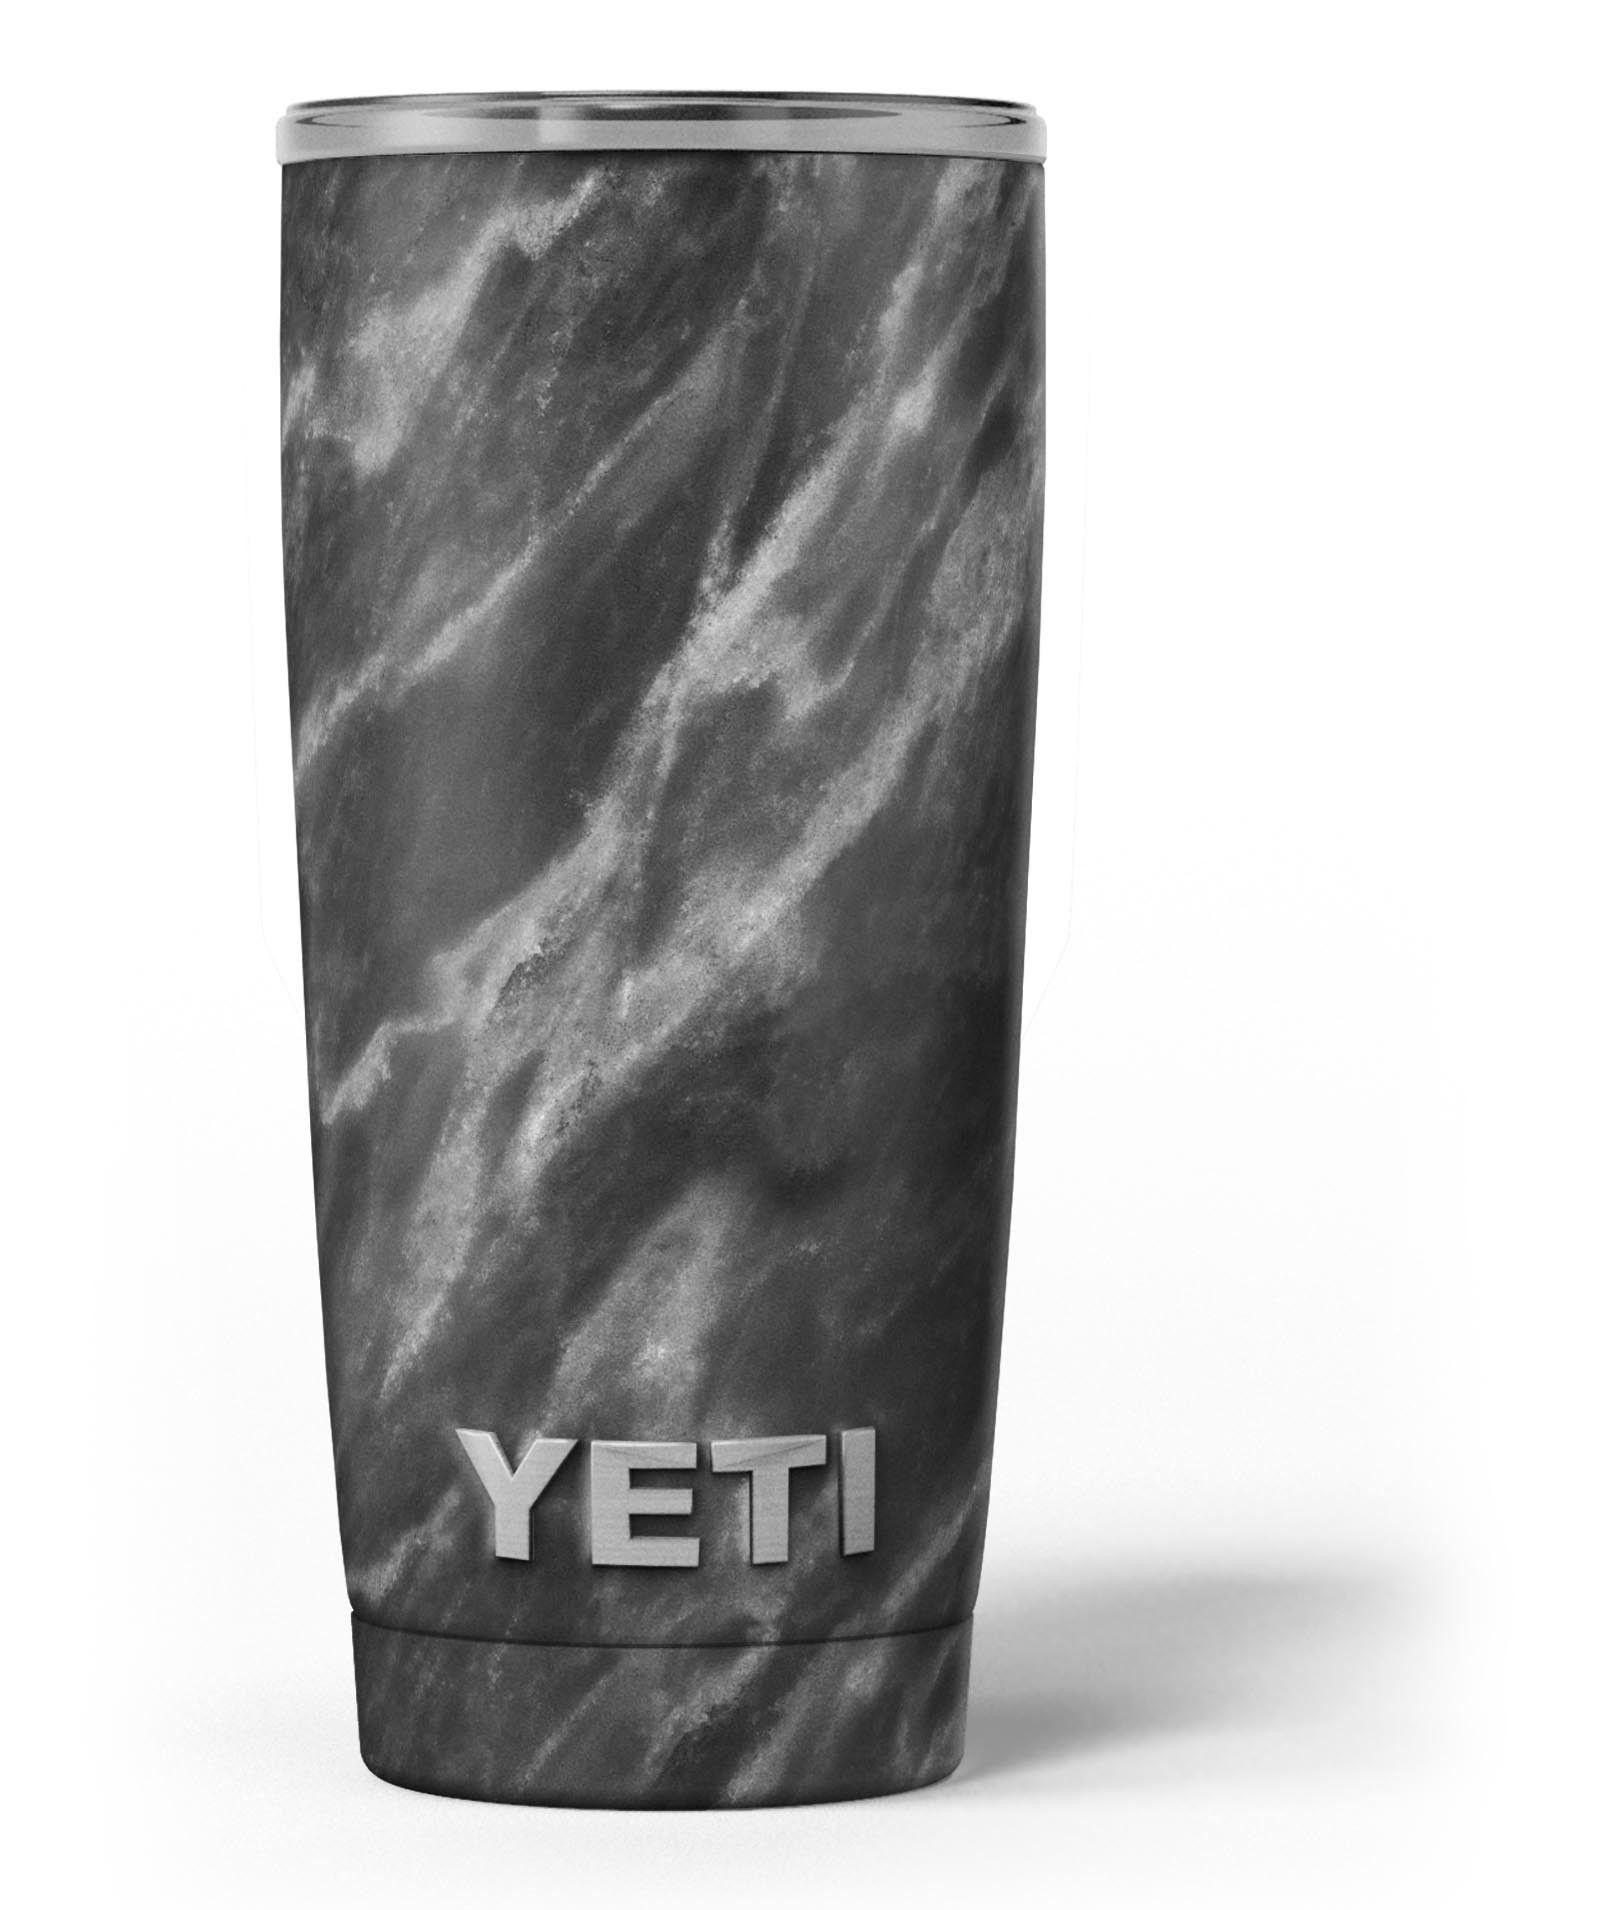 Black and Chalky White Marble Yeti Rambler Skin Kit Yeti